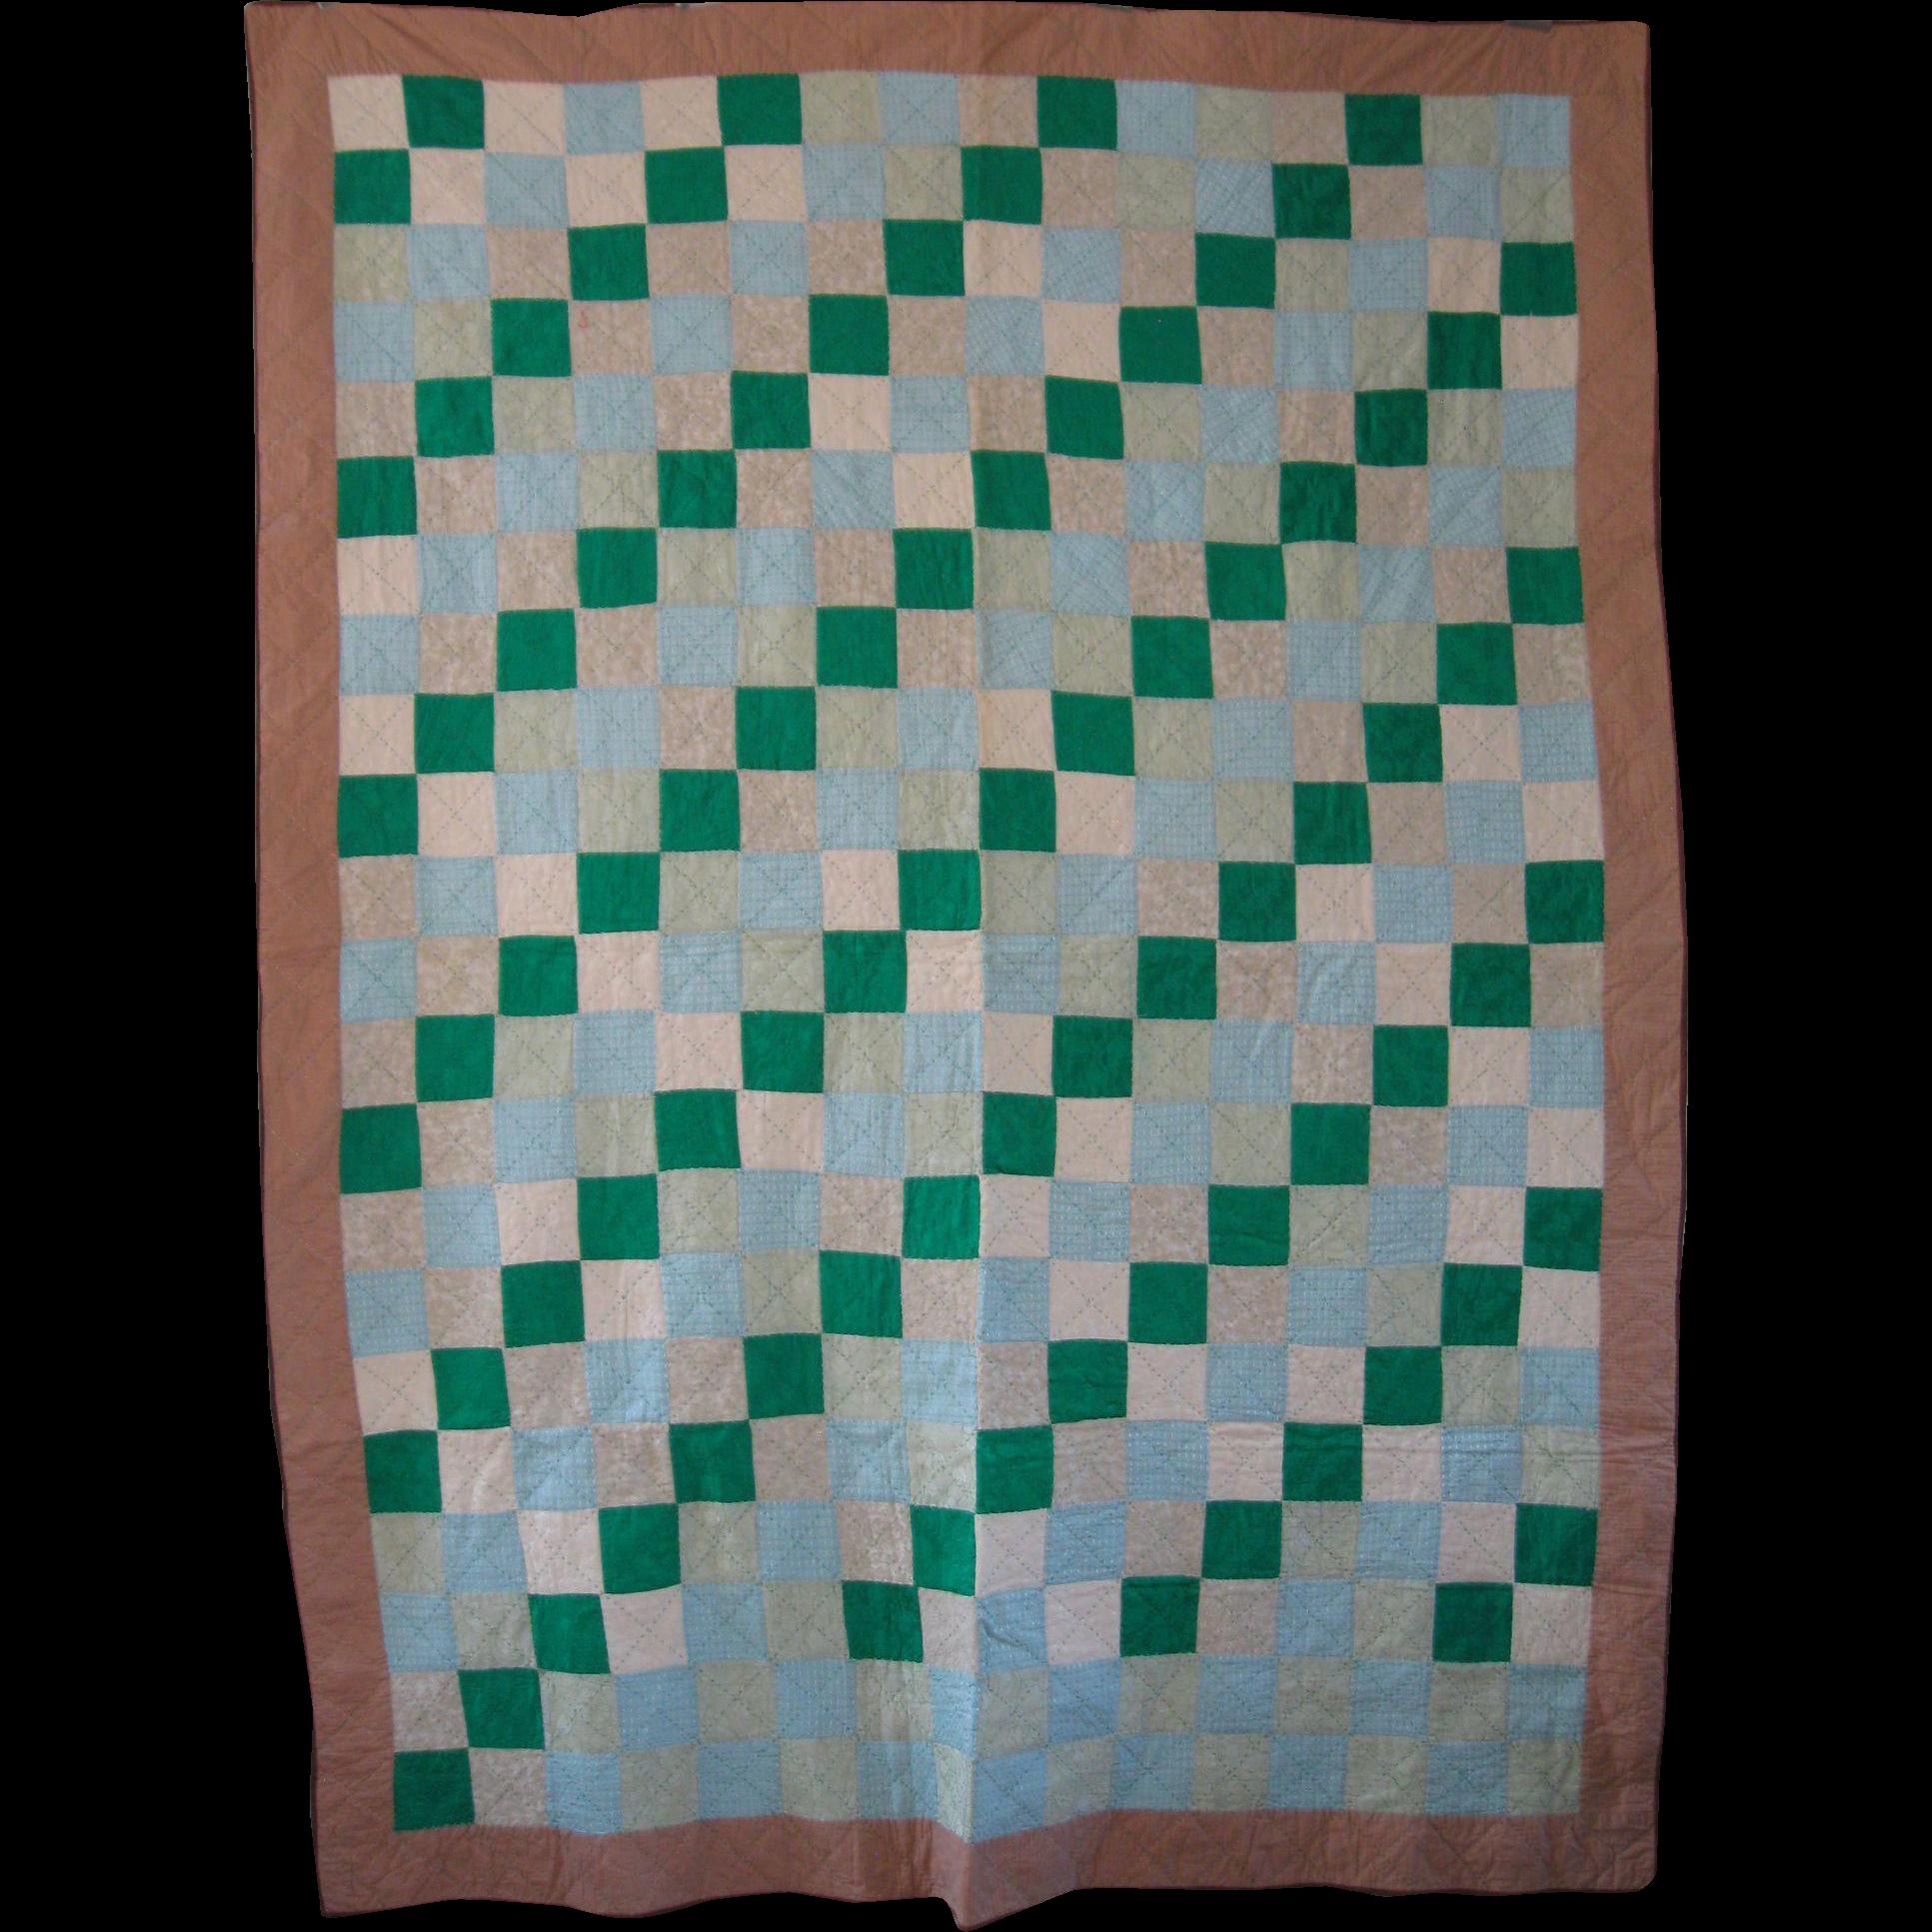 Vintage Mennonite/Amish Graphic Irish Chain Quilt